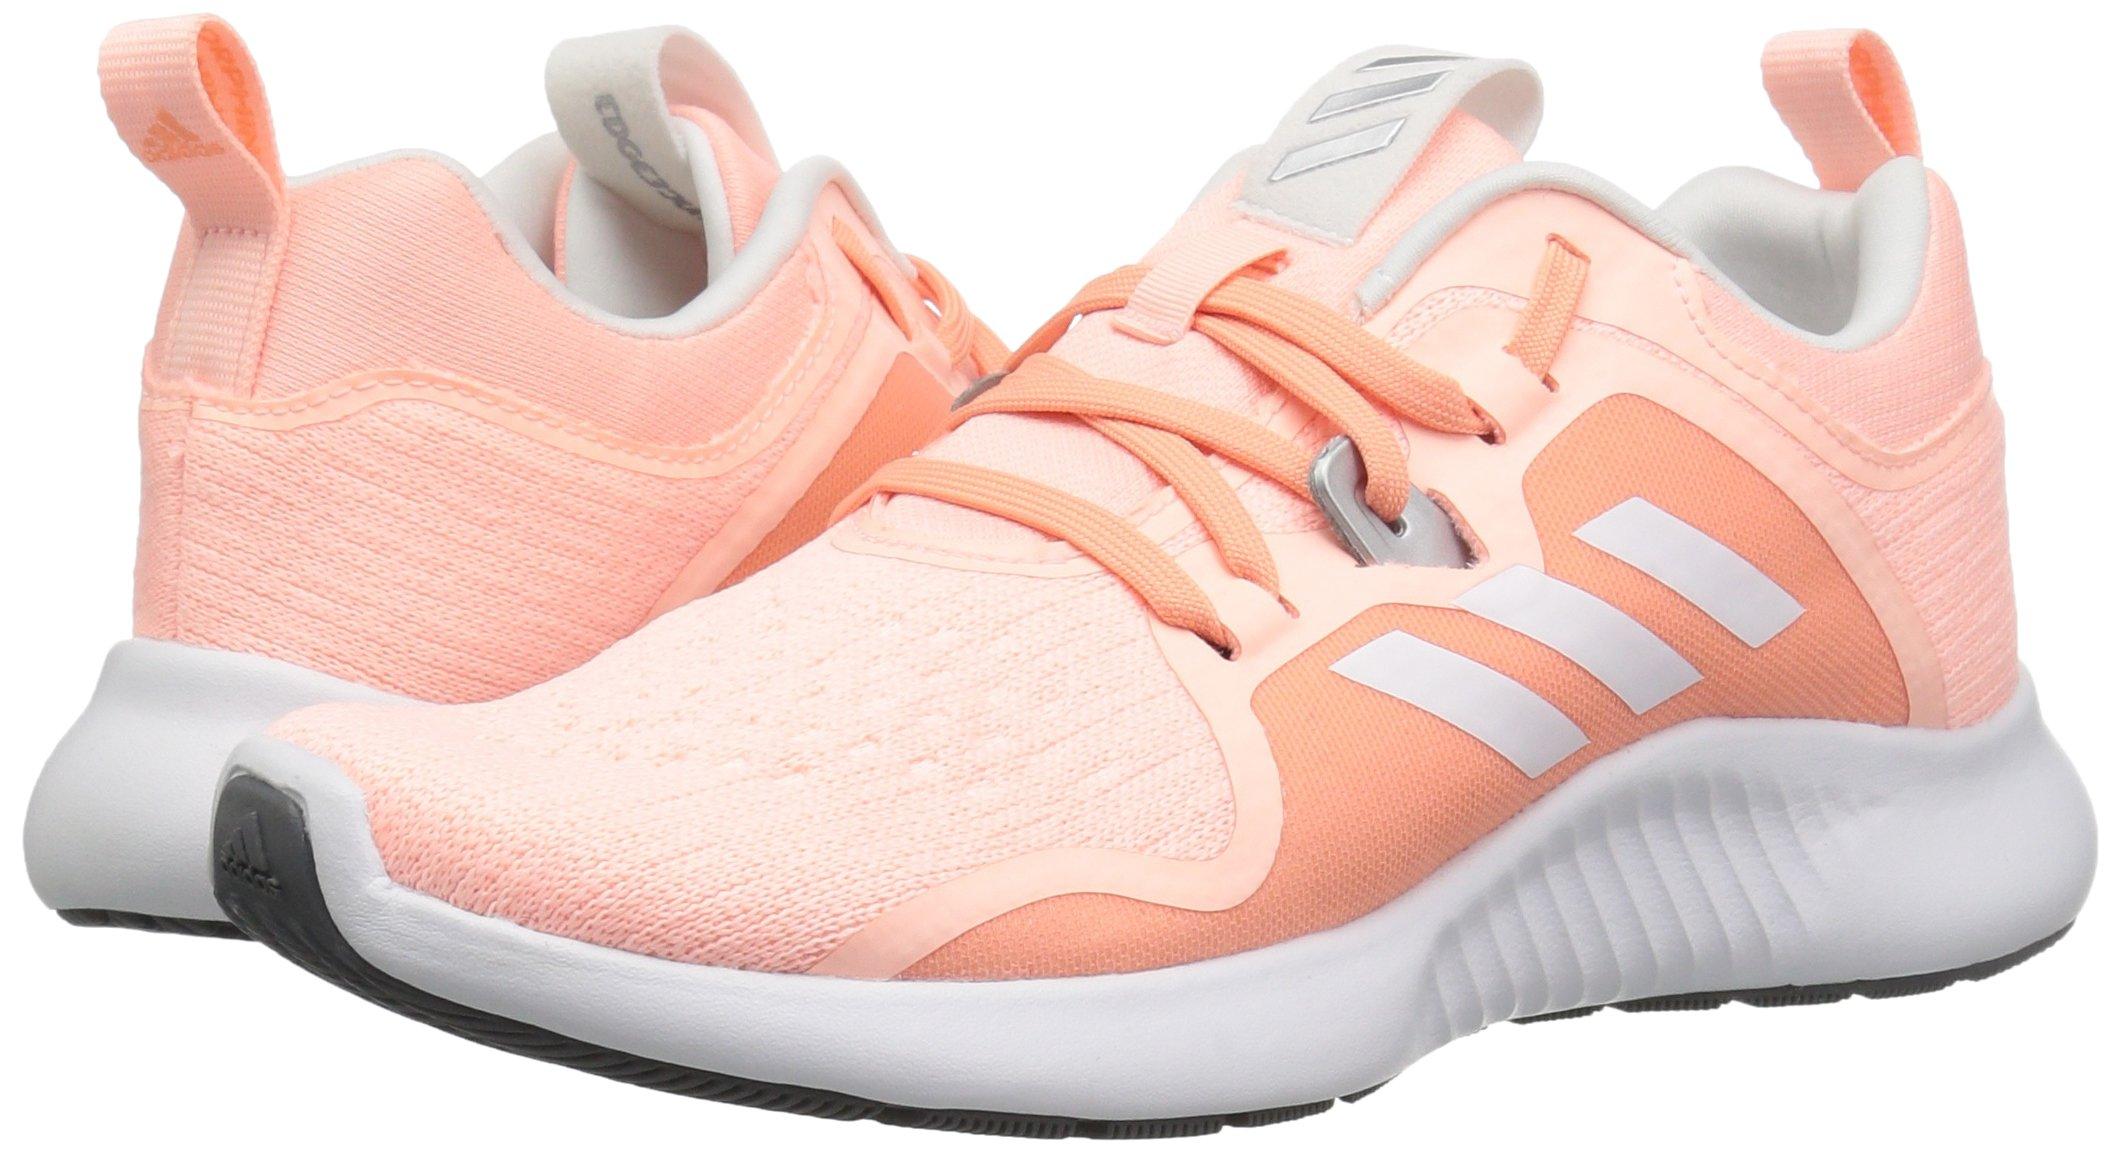 adidas Women's EdgeBounce Running Shoe Clear Orange/White/Copper Metallic 5 M US by adidas (Image #5)